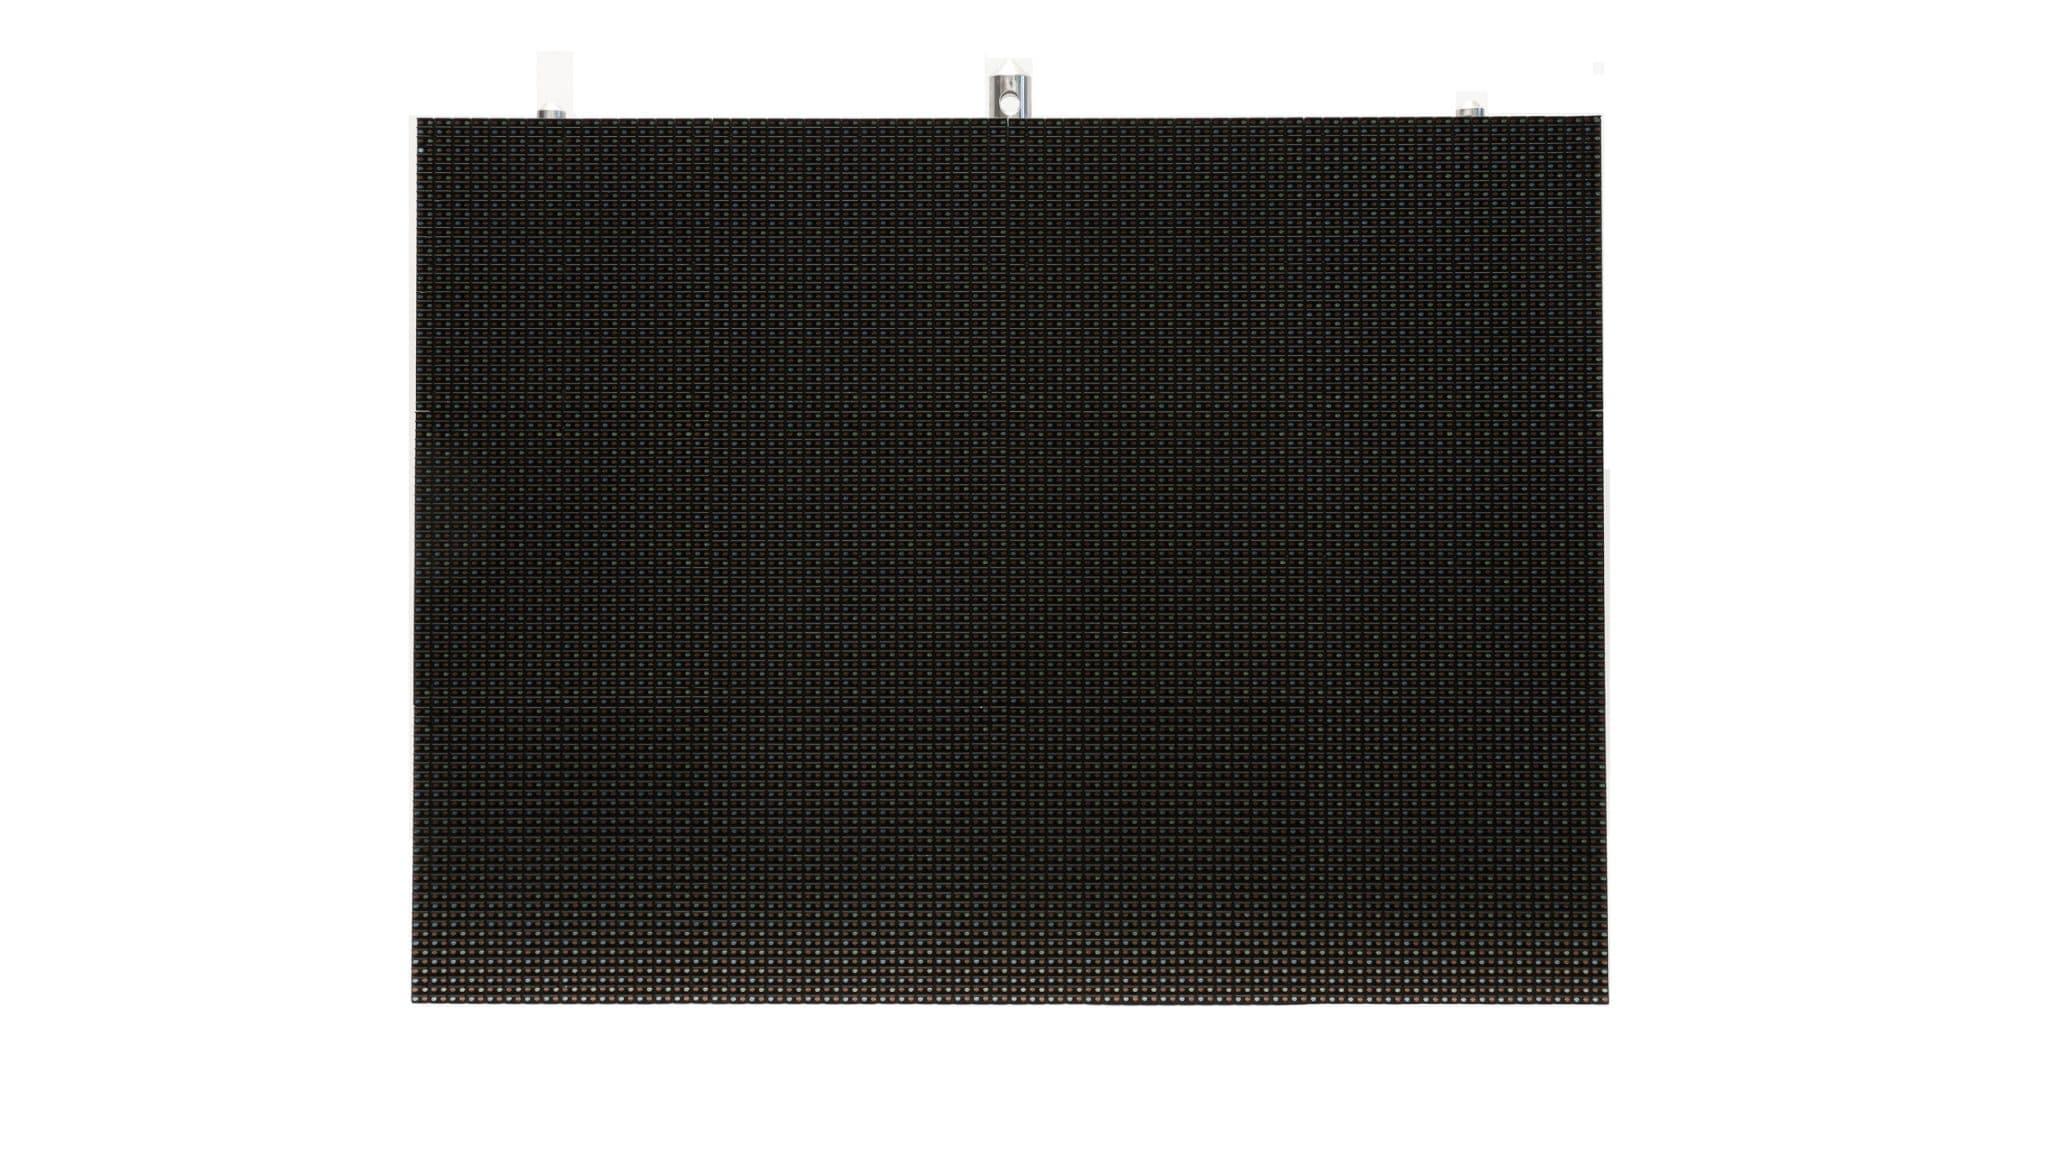 LEDitgo R6-12 Front